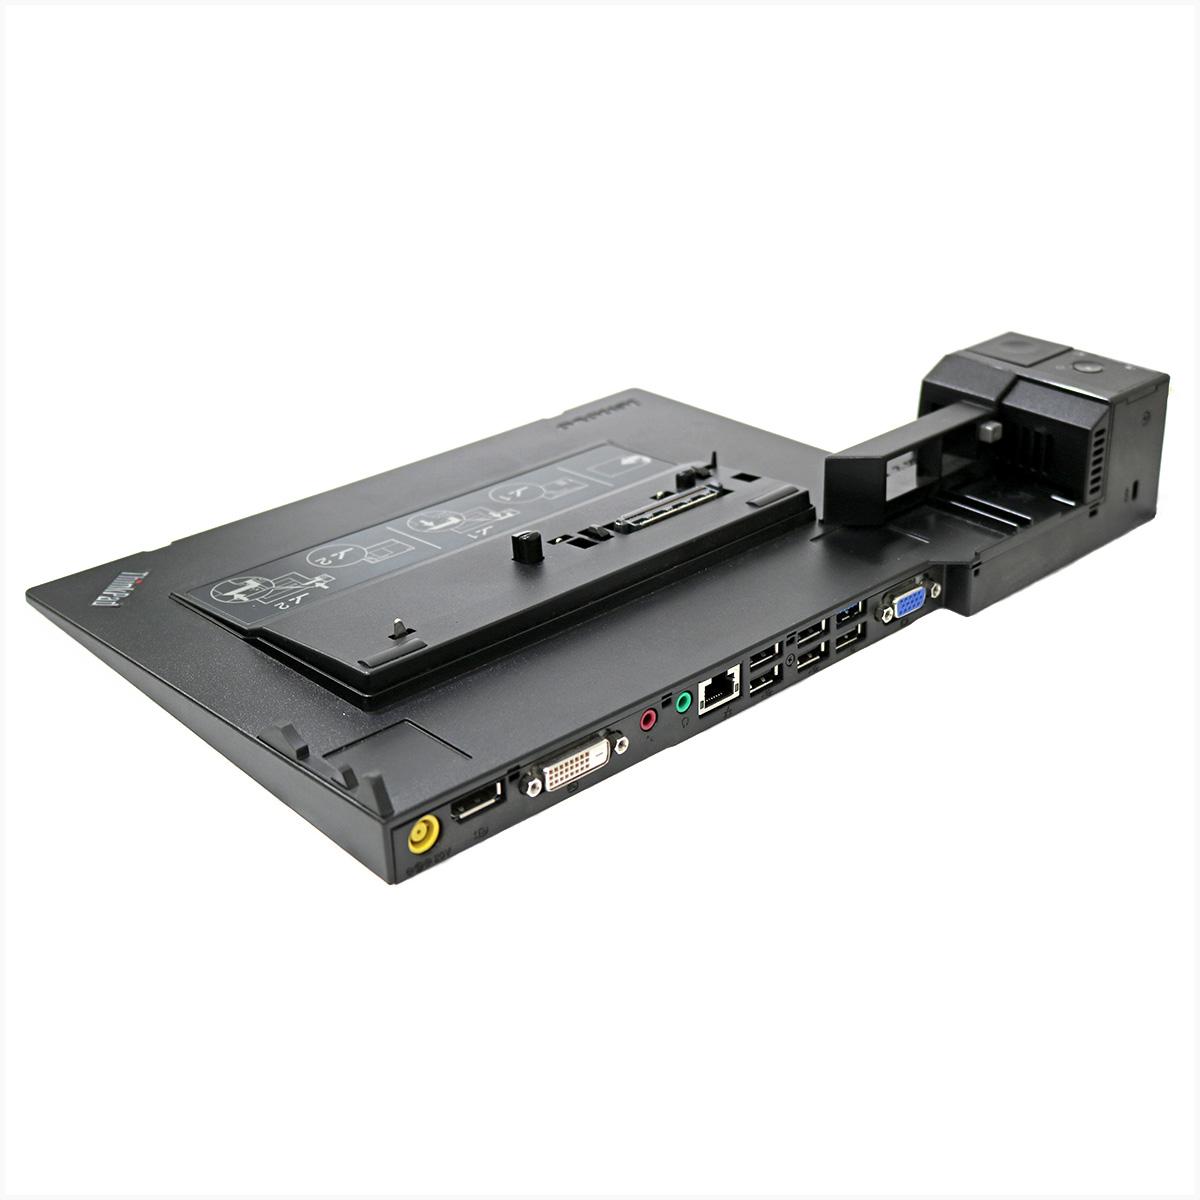 Dockstation lenovo mini dock plus series 3 usb 3.0 - usado